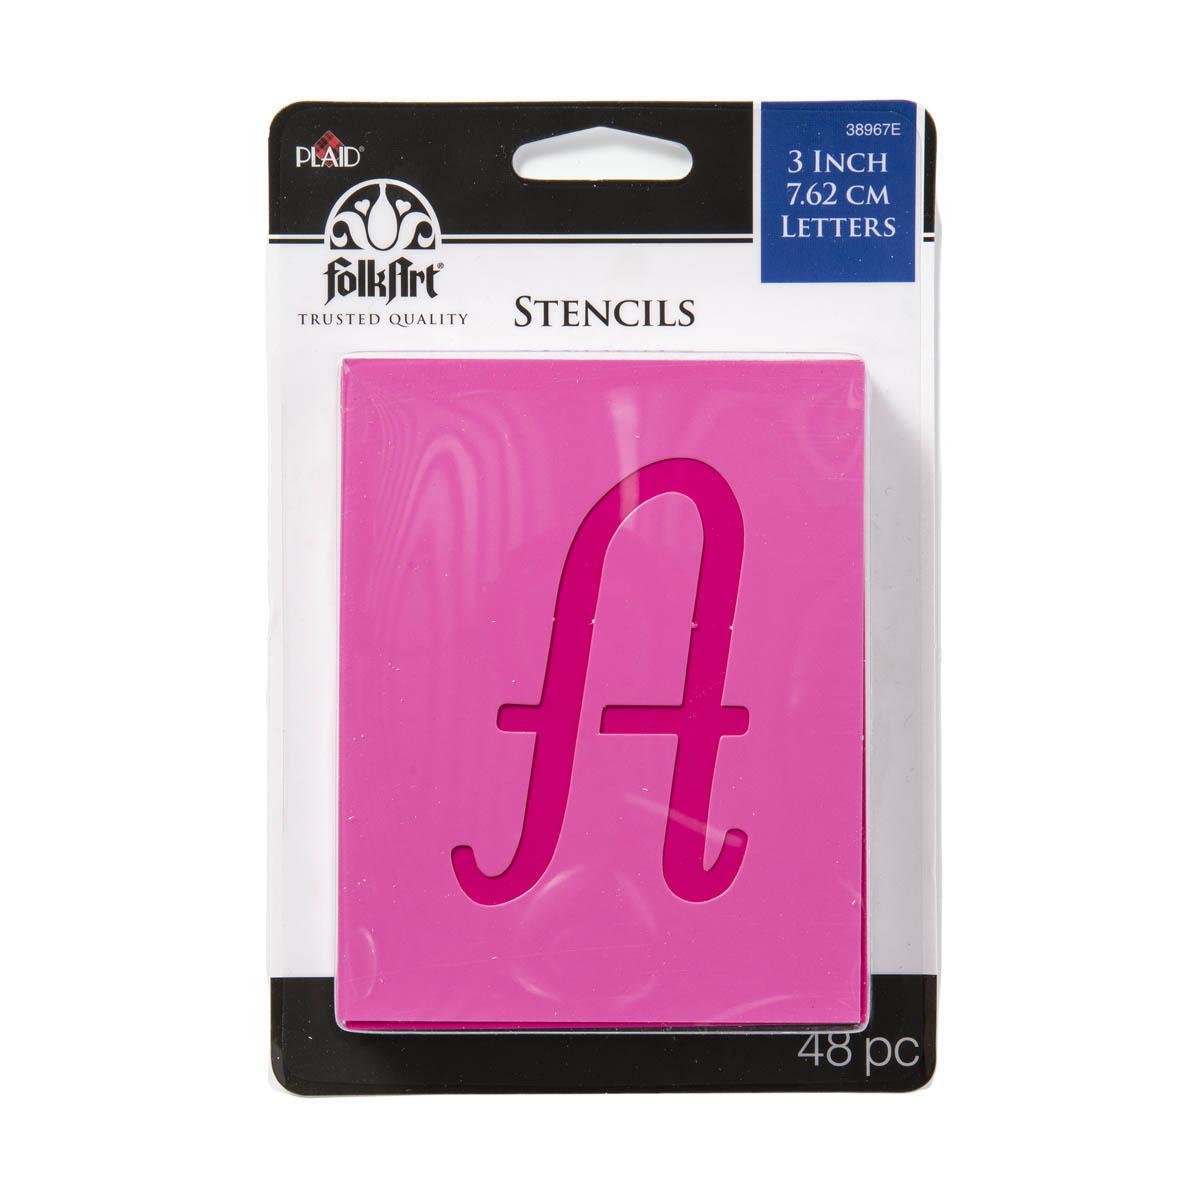 FolkArt ® Stencil Value Packs - Letter Stencils - Script